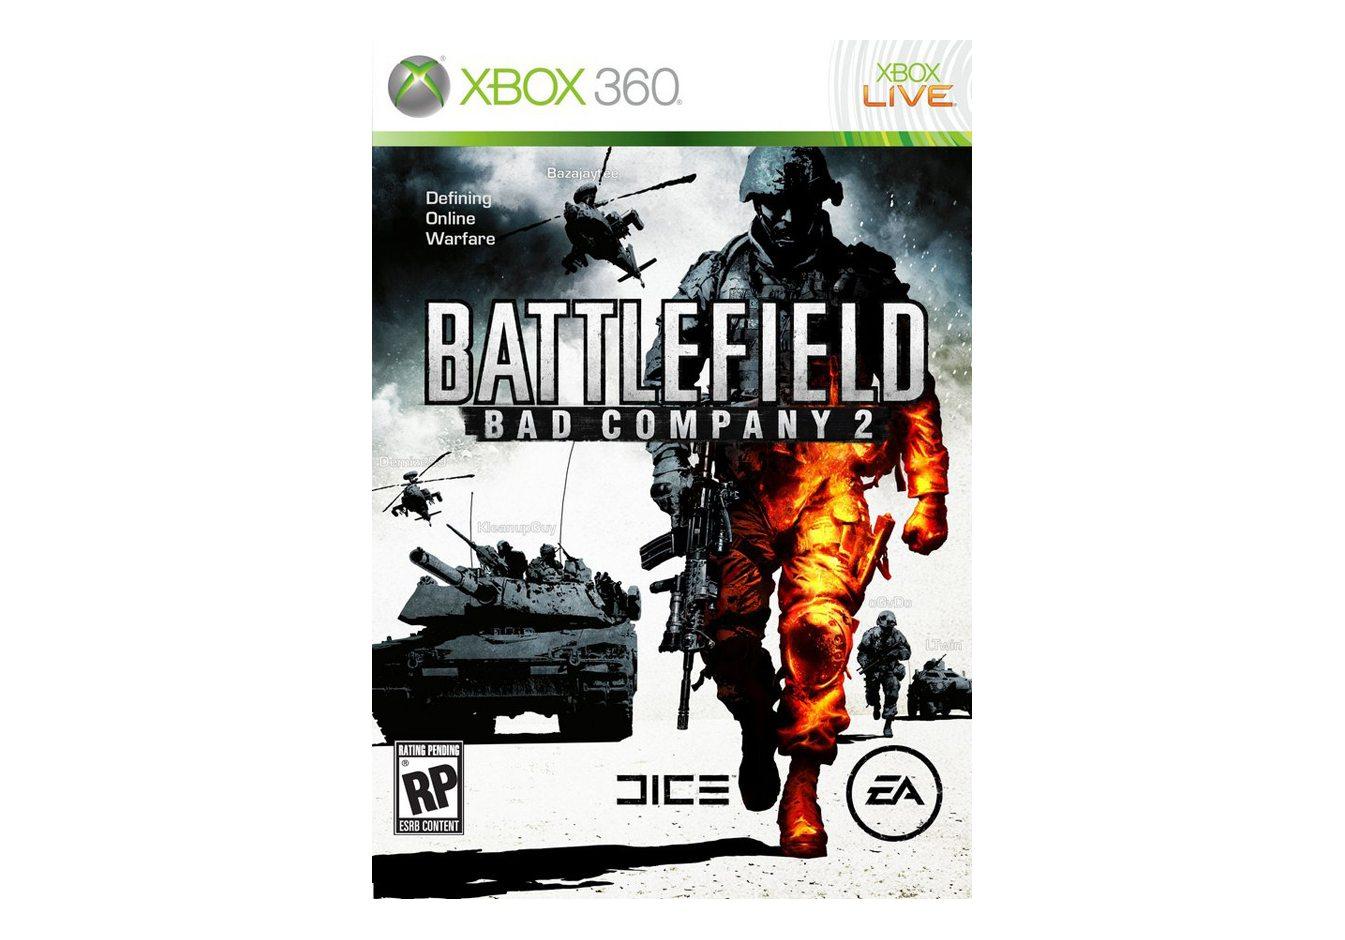 Xbox 360 Battlefield: Bad Company 2 Xbox 360